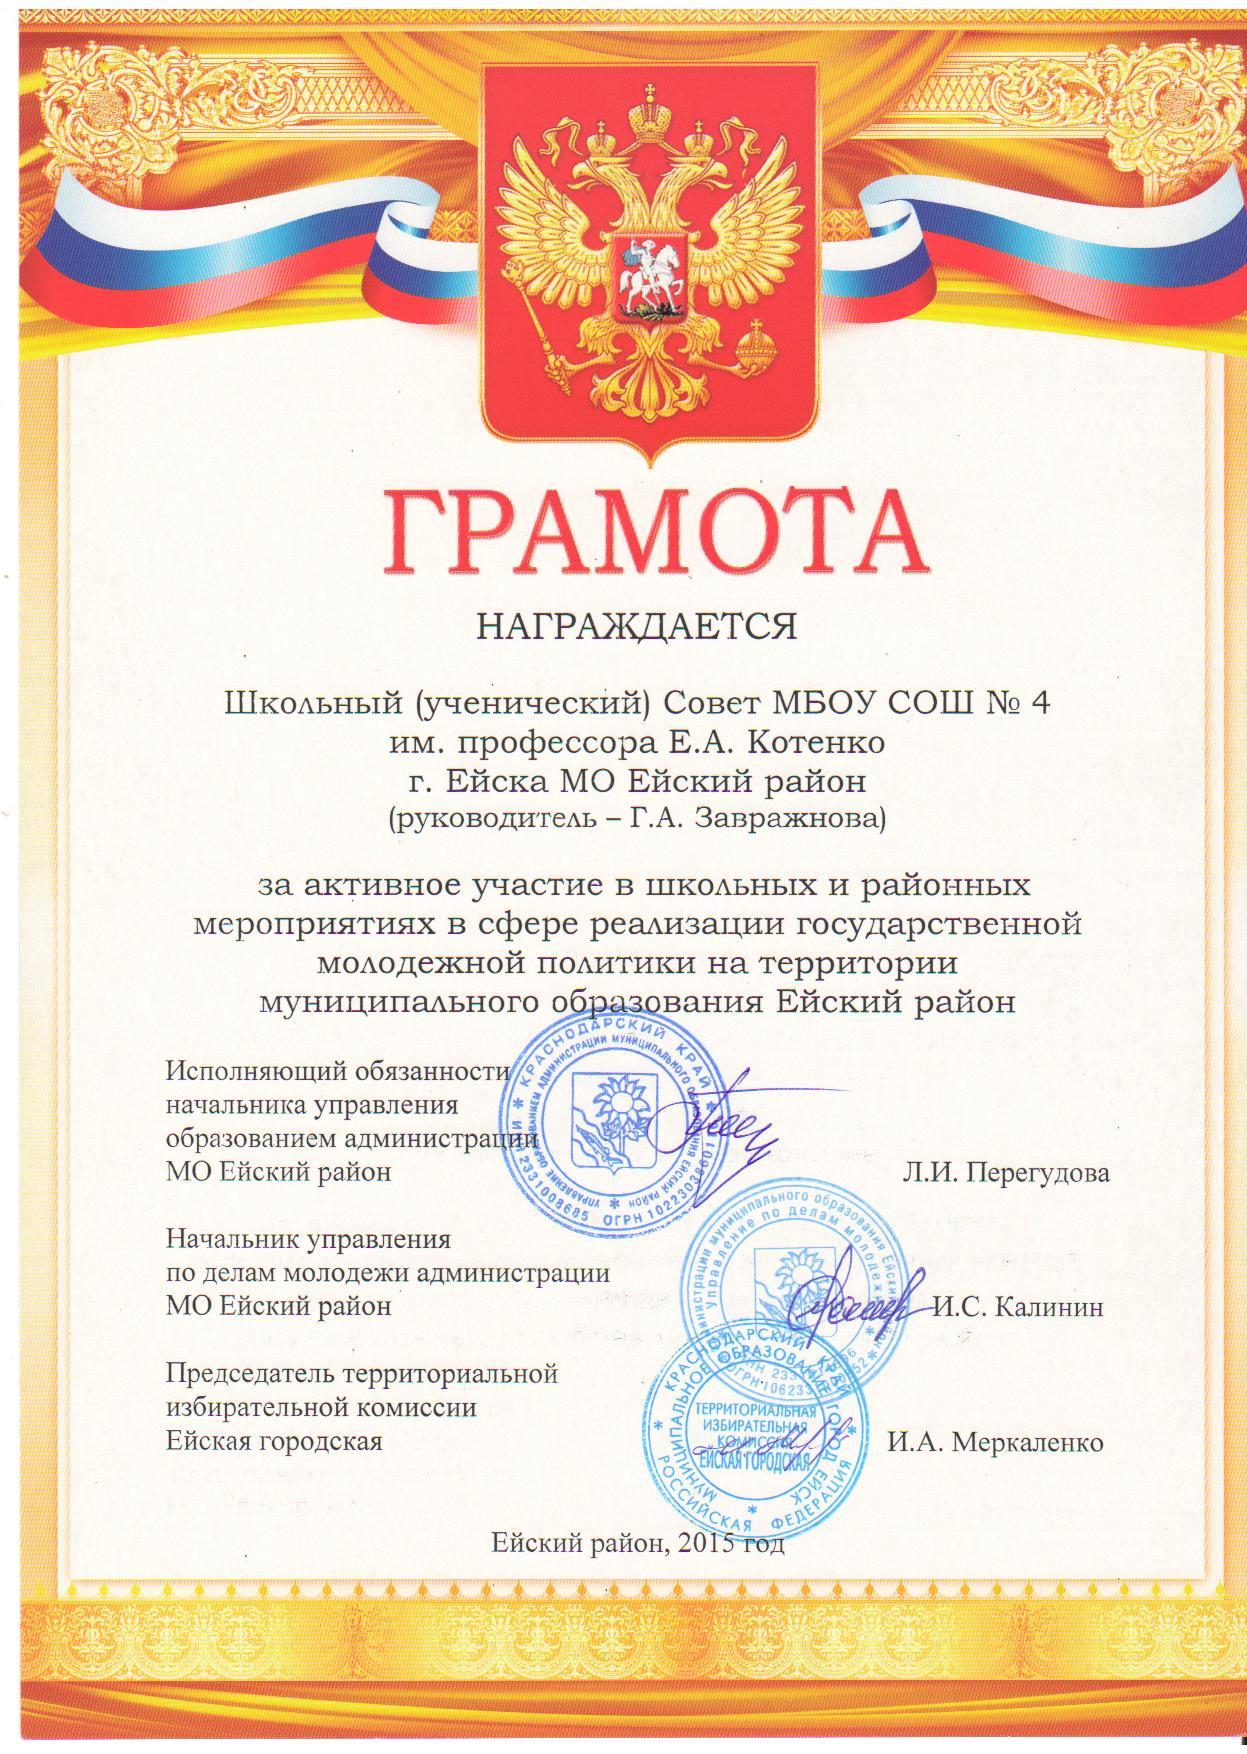 shus-gramota-1